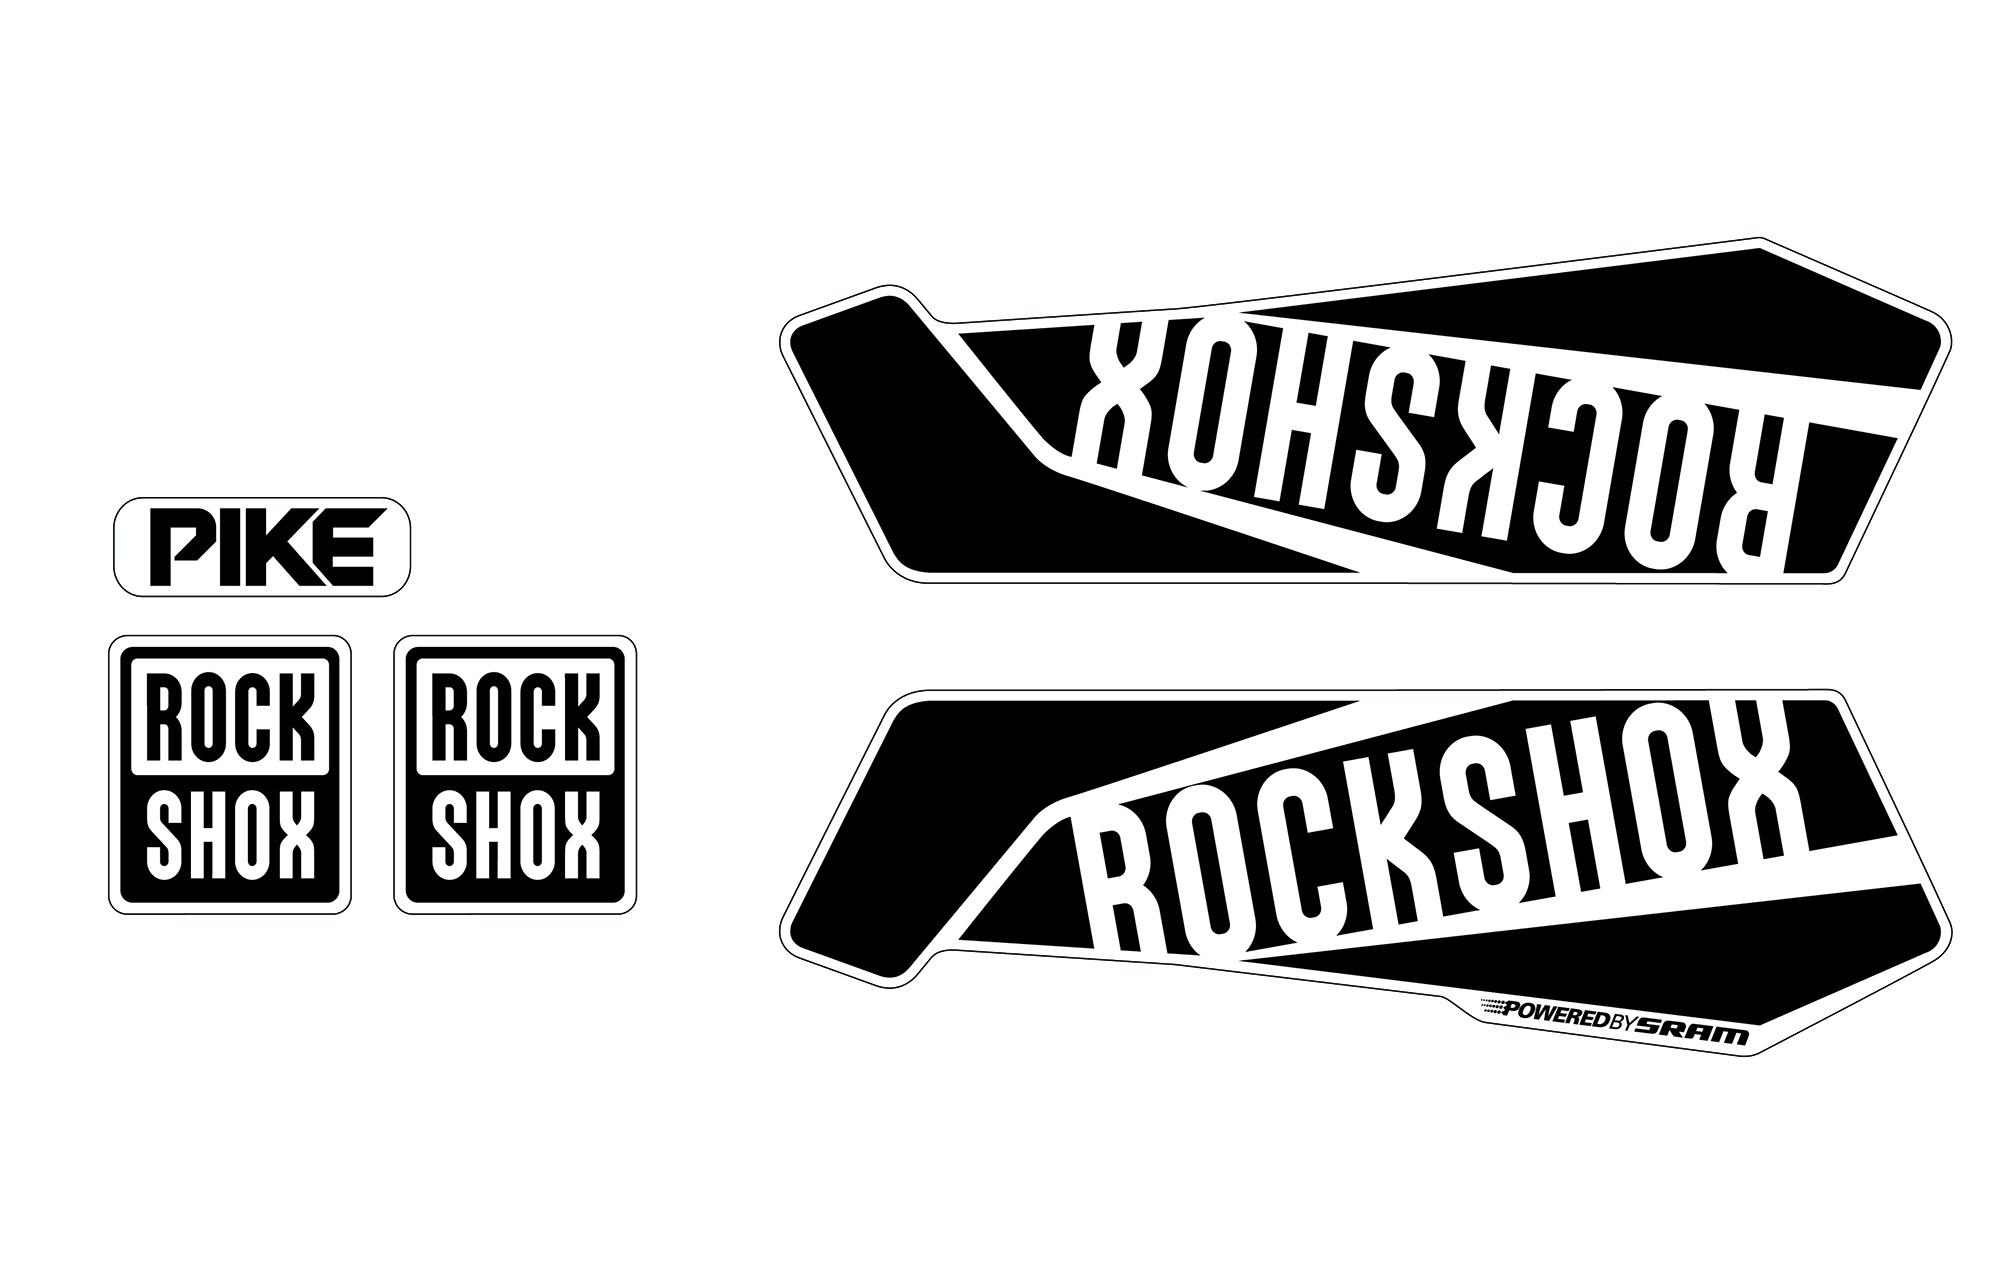 Rockshox Pike Sticker Kit Shiny Black C2x22194548 besides Wheel brake cylinders 1 furthermore Lapierre Overvolt 2016 Bosch Yamaha Electric Bikes besides Popup product additionally 6700 2012. on brakes